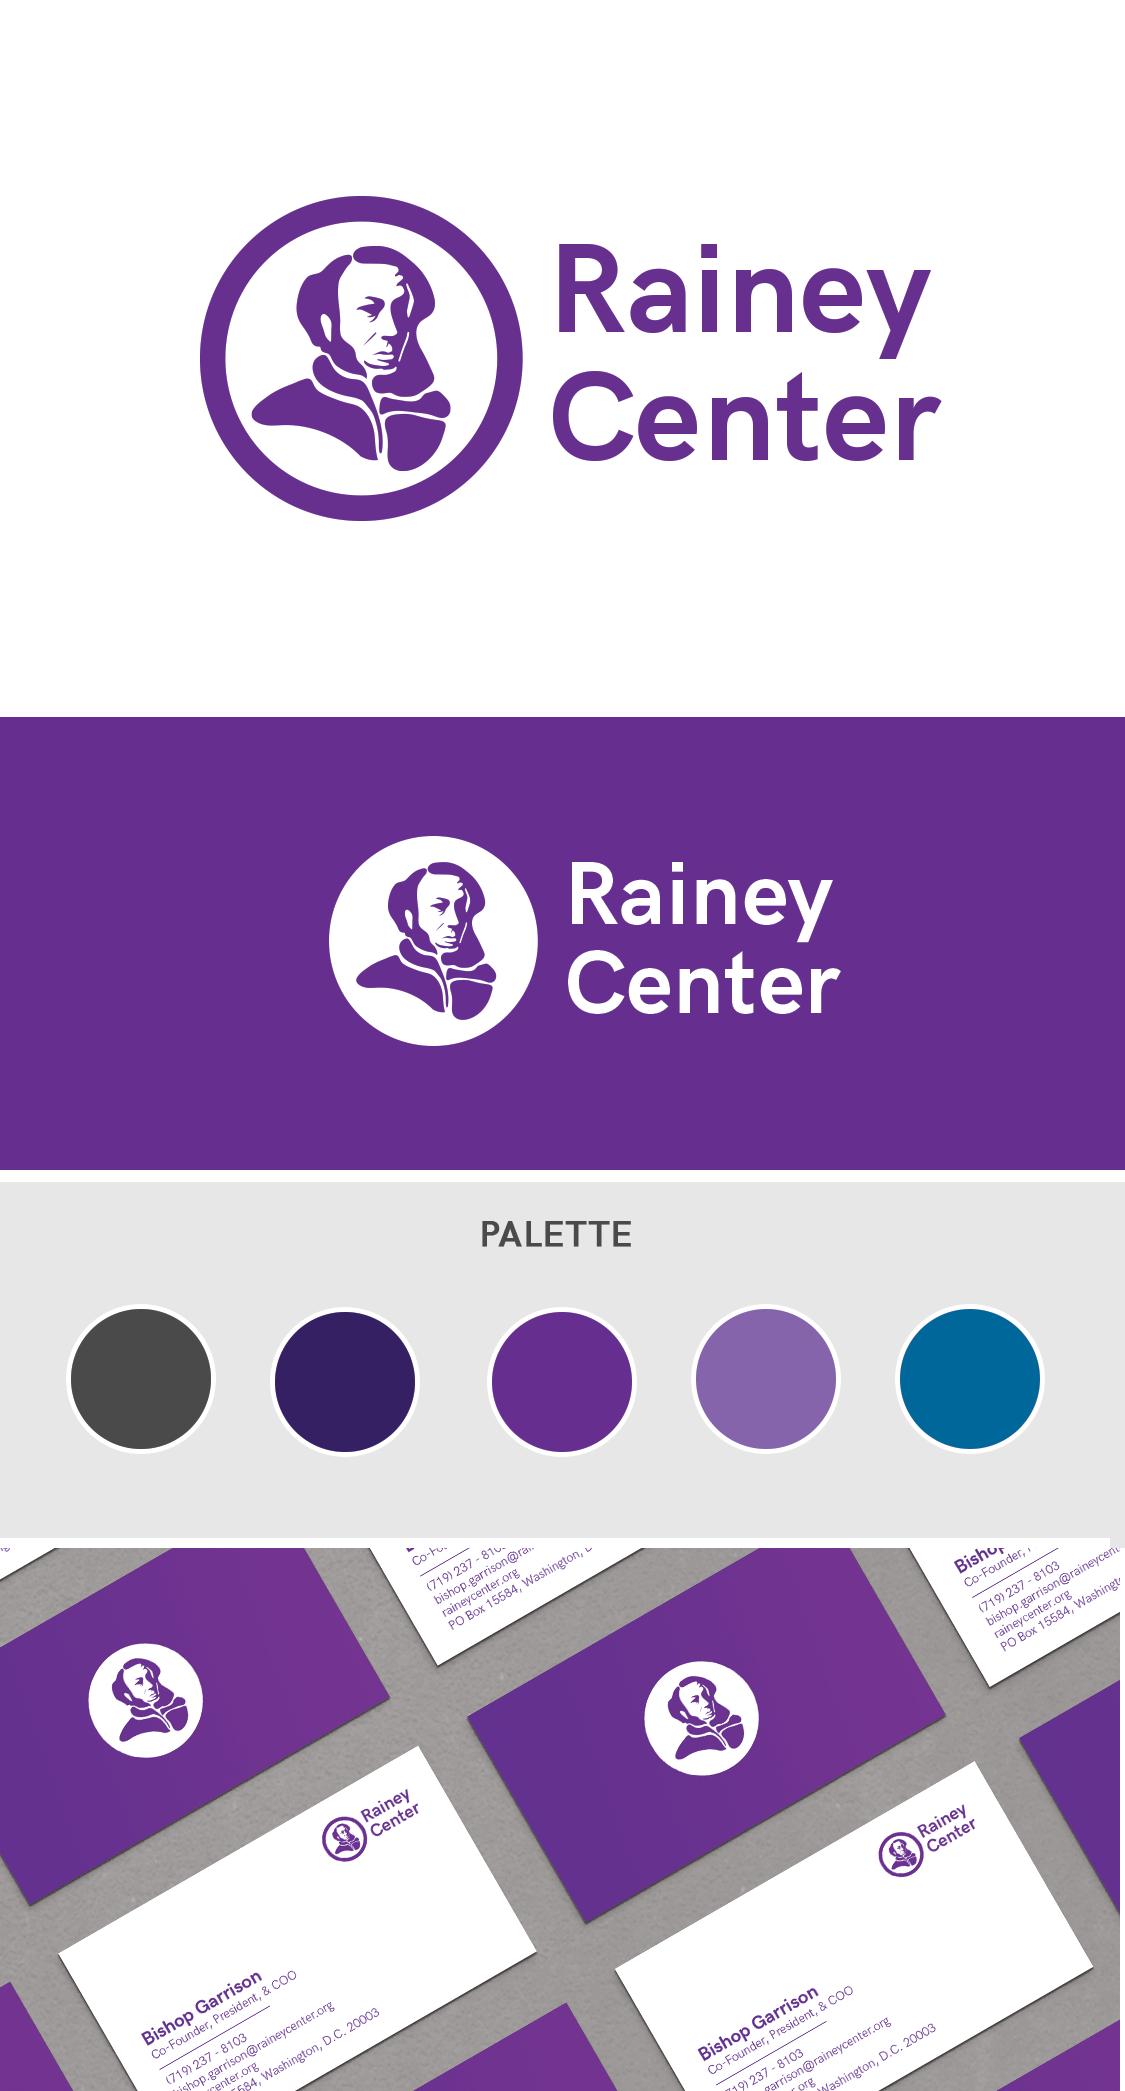 RaineyCenterBrandingGuide.png